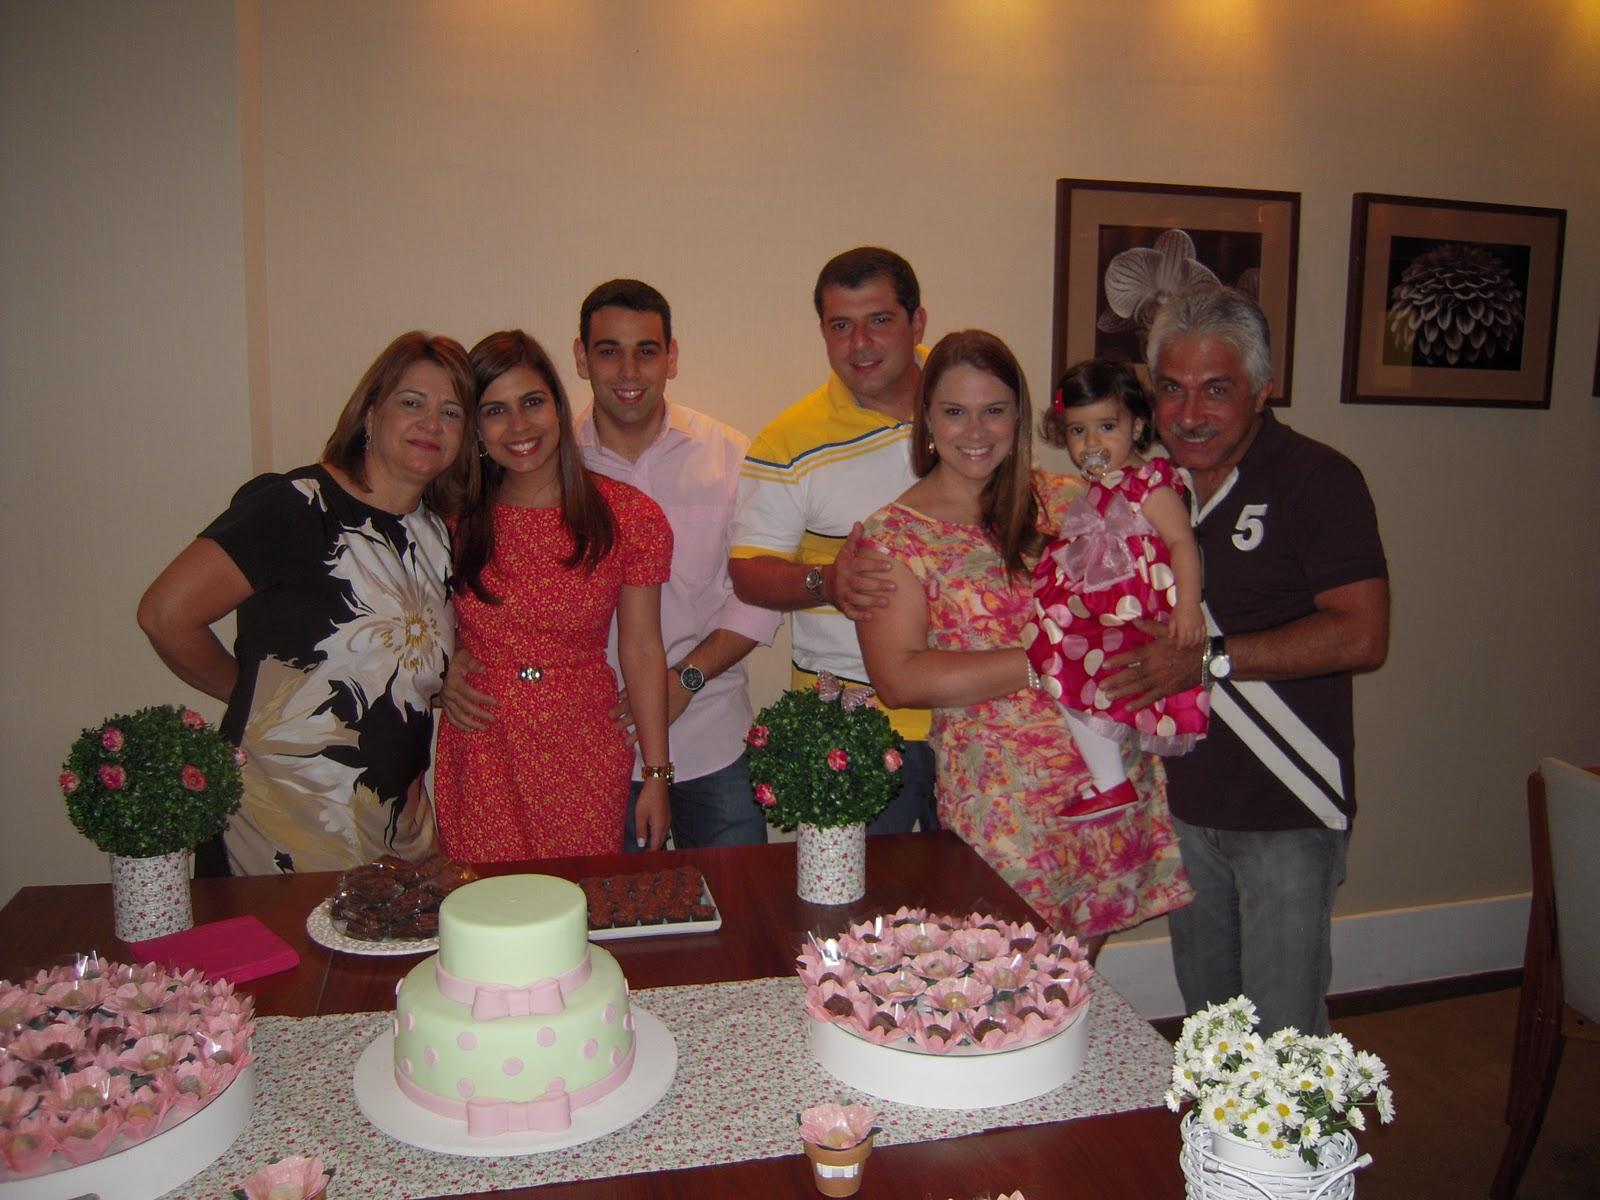 decoracao festa noivado : decoracao festa noivado:Noiva para Casar: Festa de Noivado